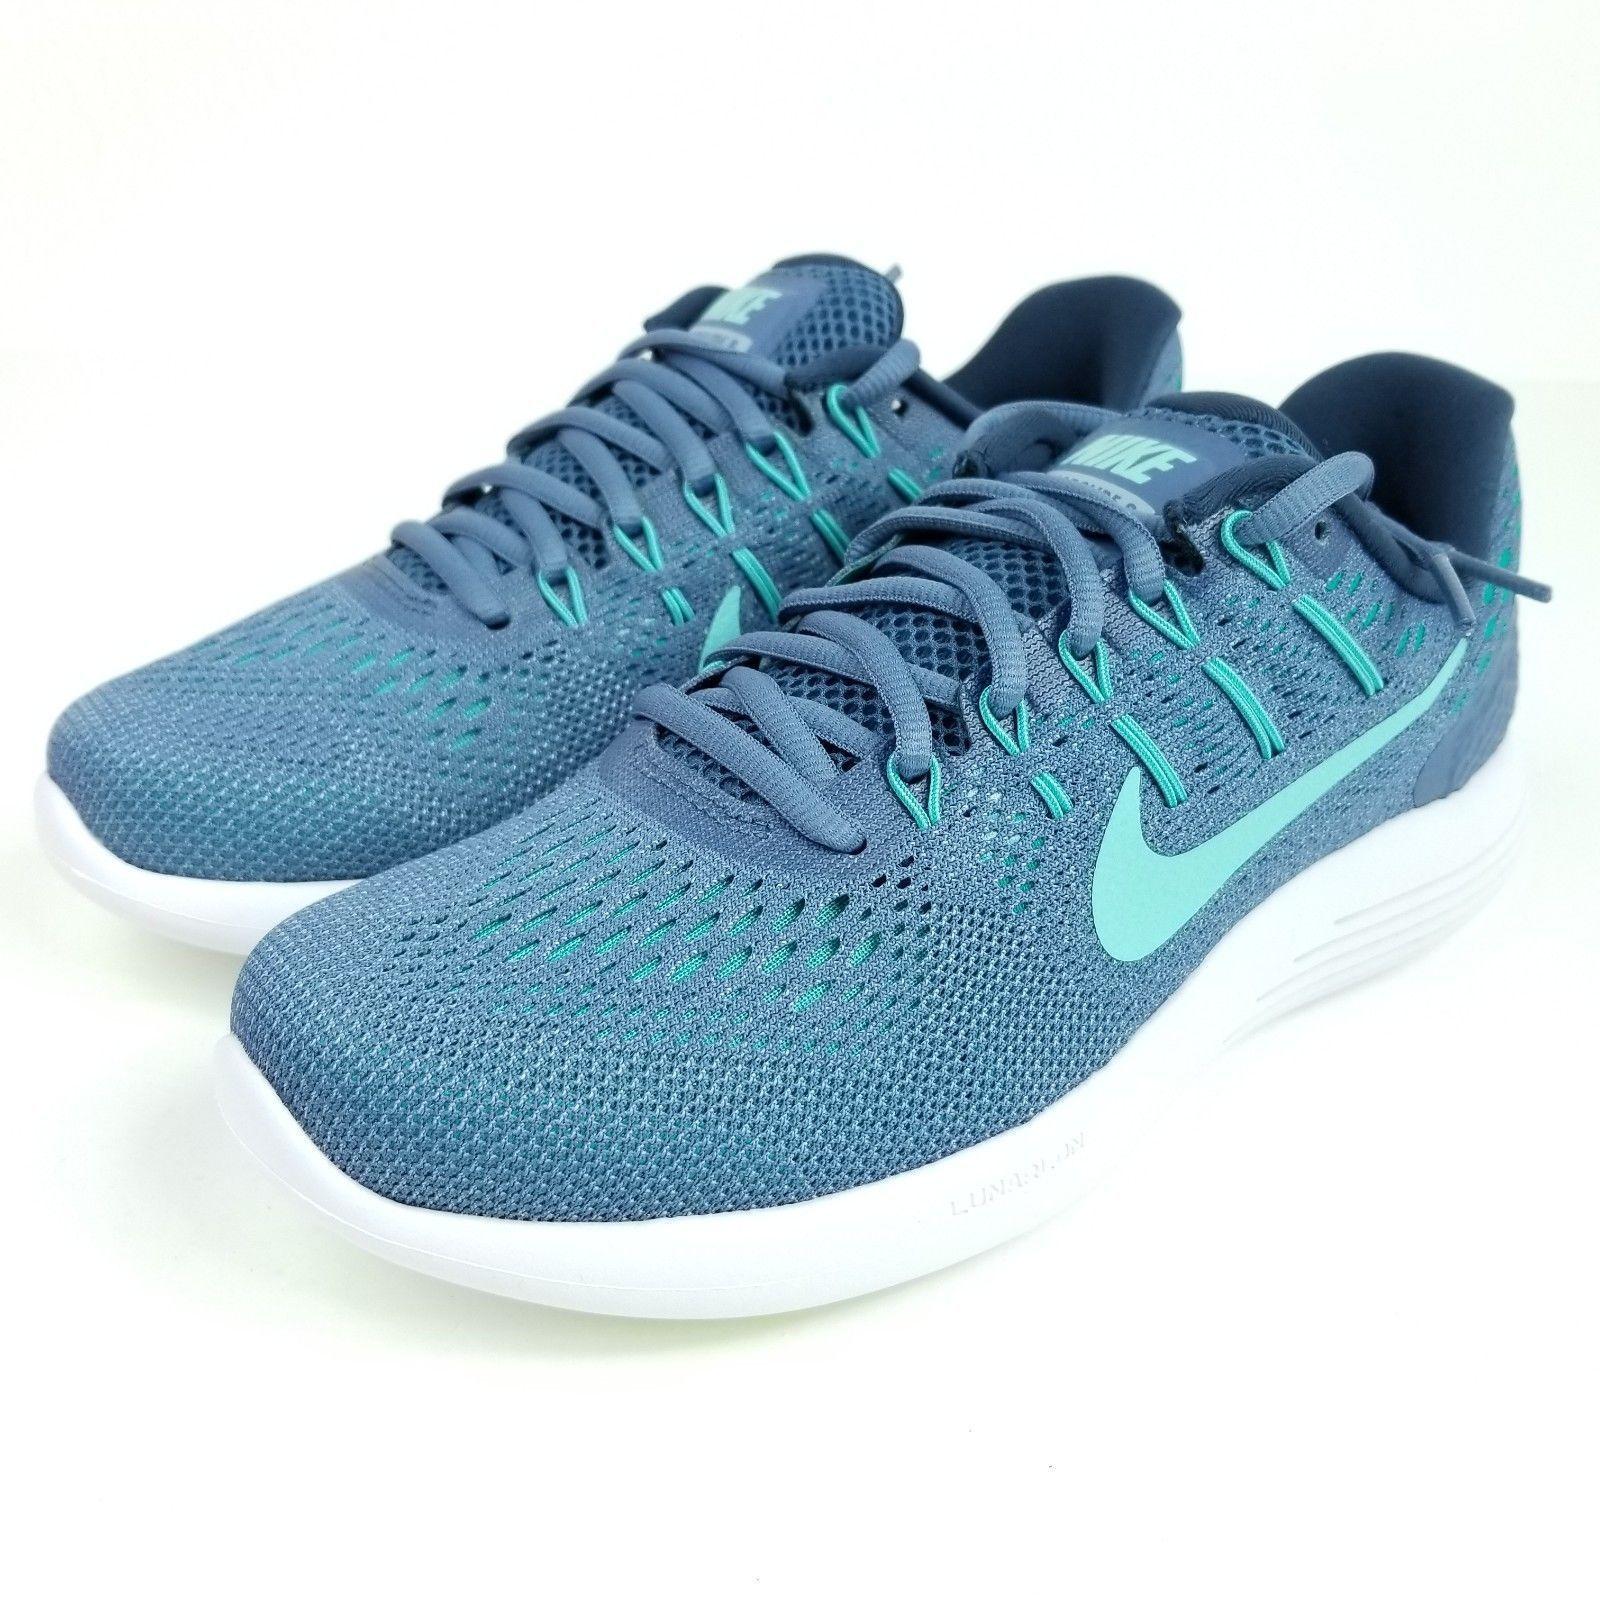 New Women\u0027s AA8677-400 Nike Lunarglide 8 Athletic Running Shoes #171125-649